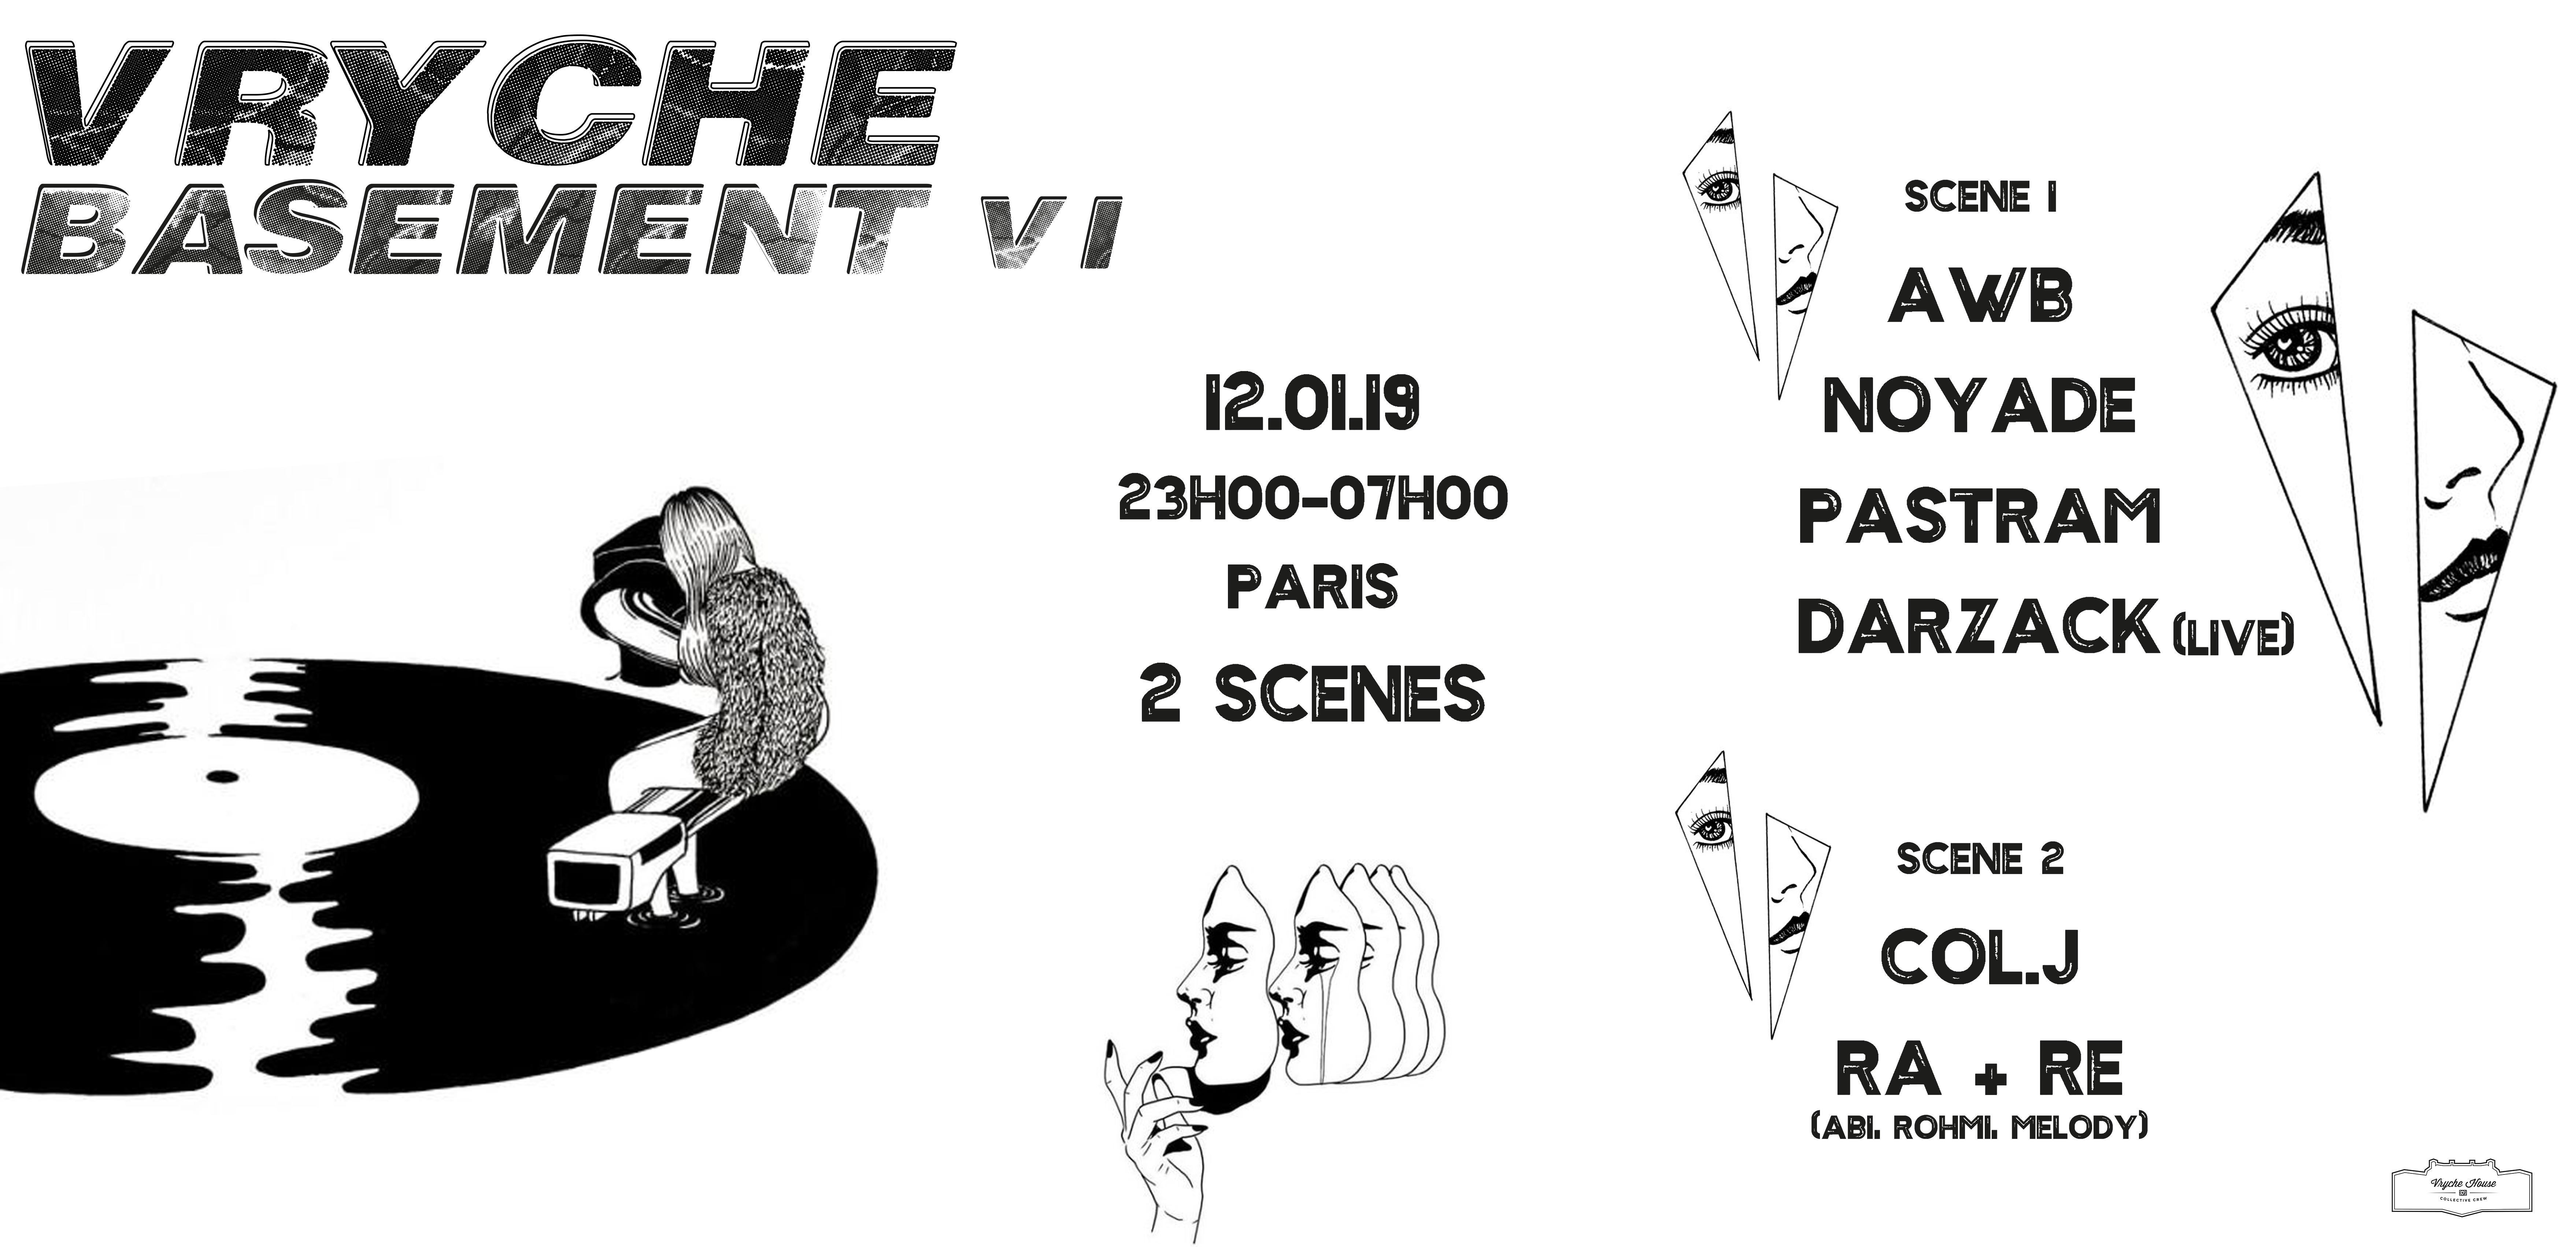 Vryche Basement VI w/ AWB, Darzack (live), RA + RE & more